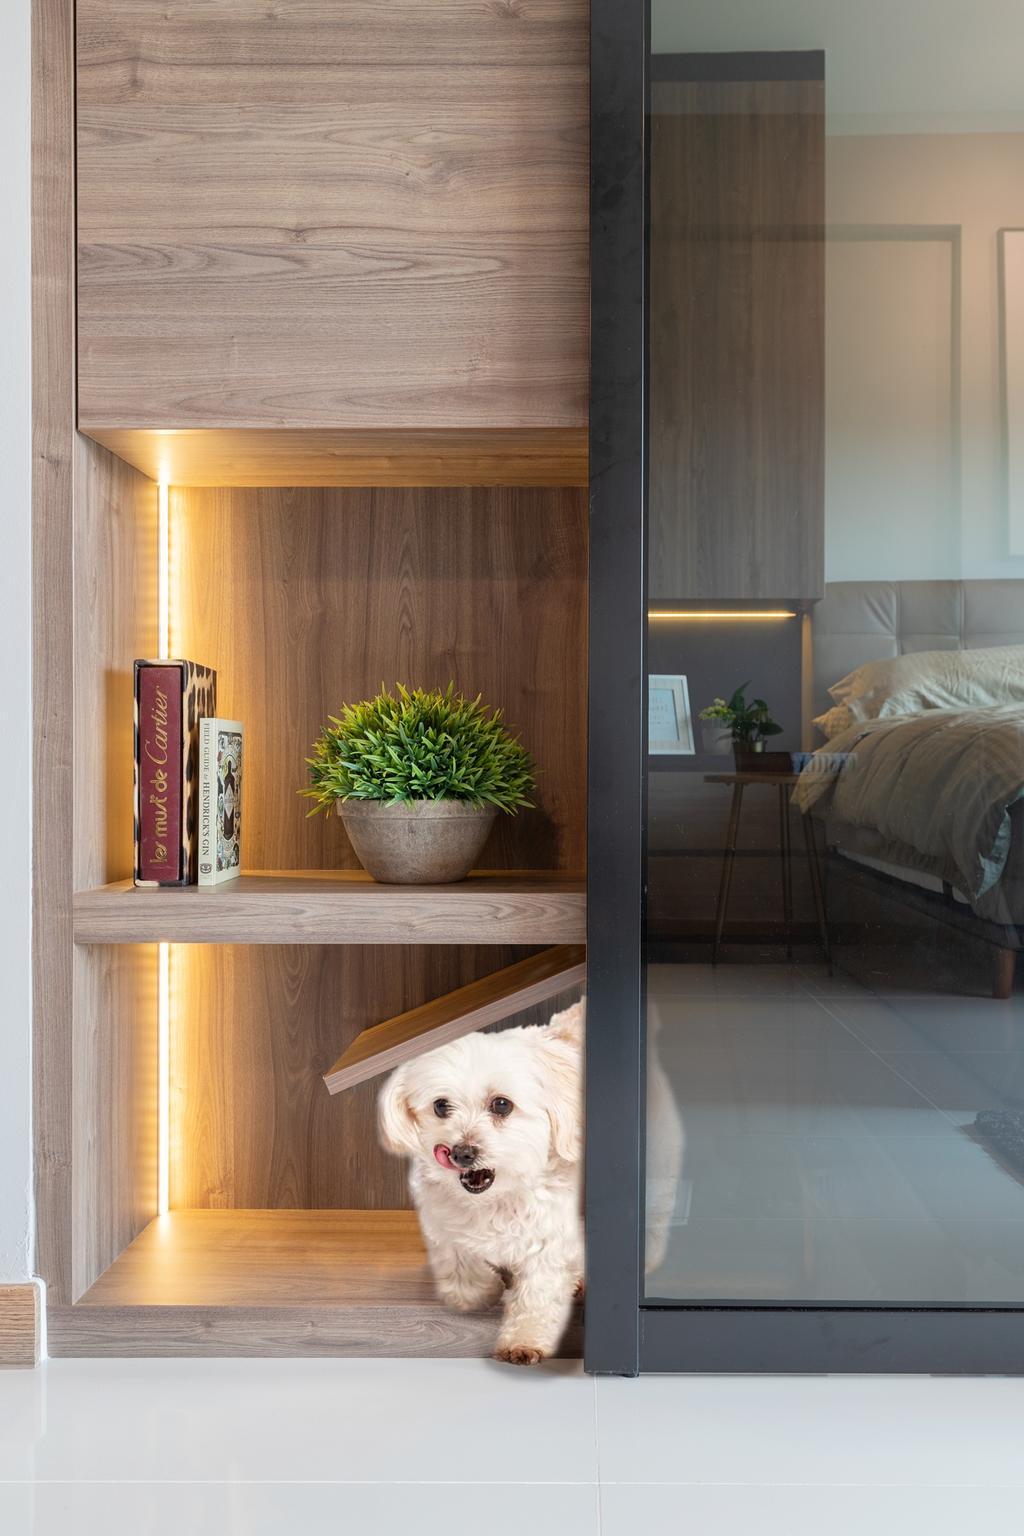 Bukit Batok Avenue 6 by The Makers Design Studio